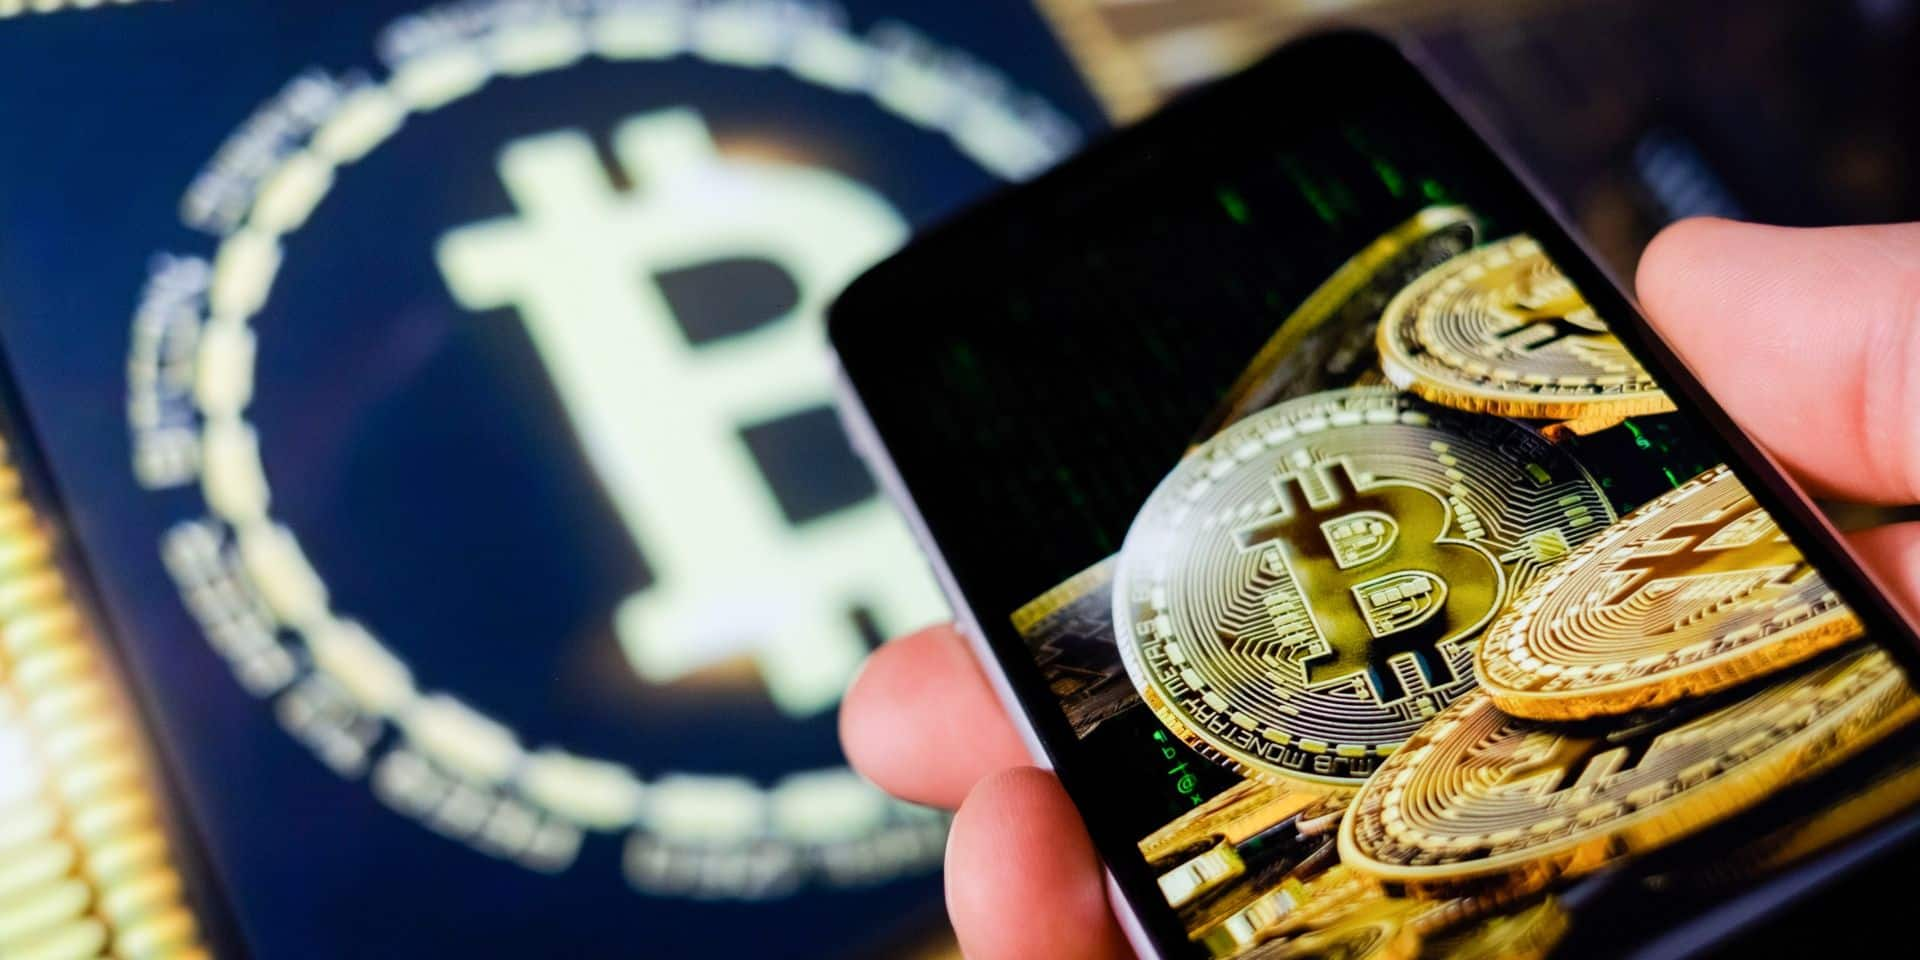 La plus célèbre des cryptomonnaies a franchi mardi la barre des 62000 dollars.